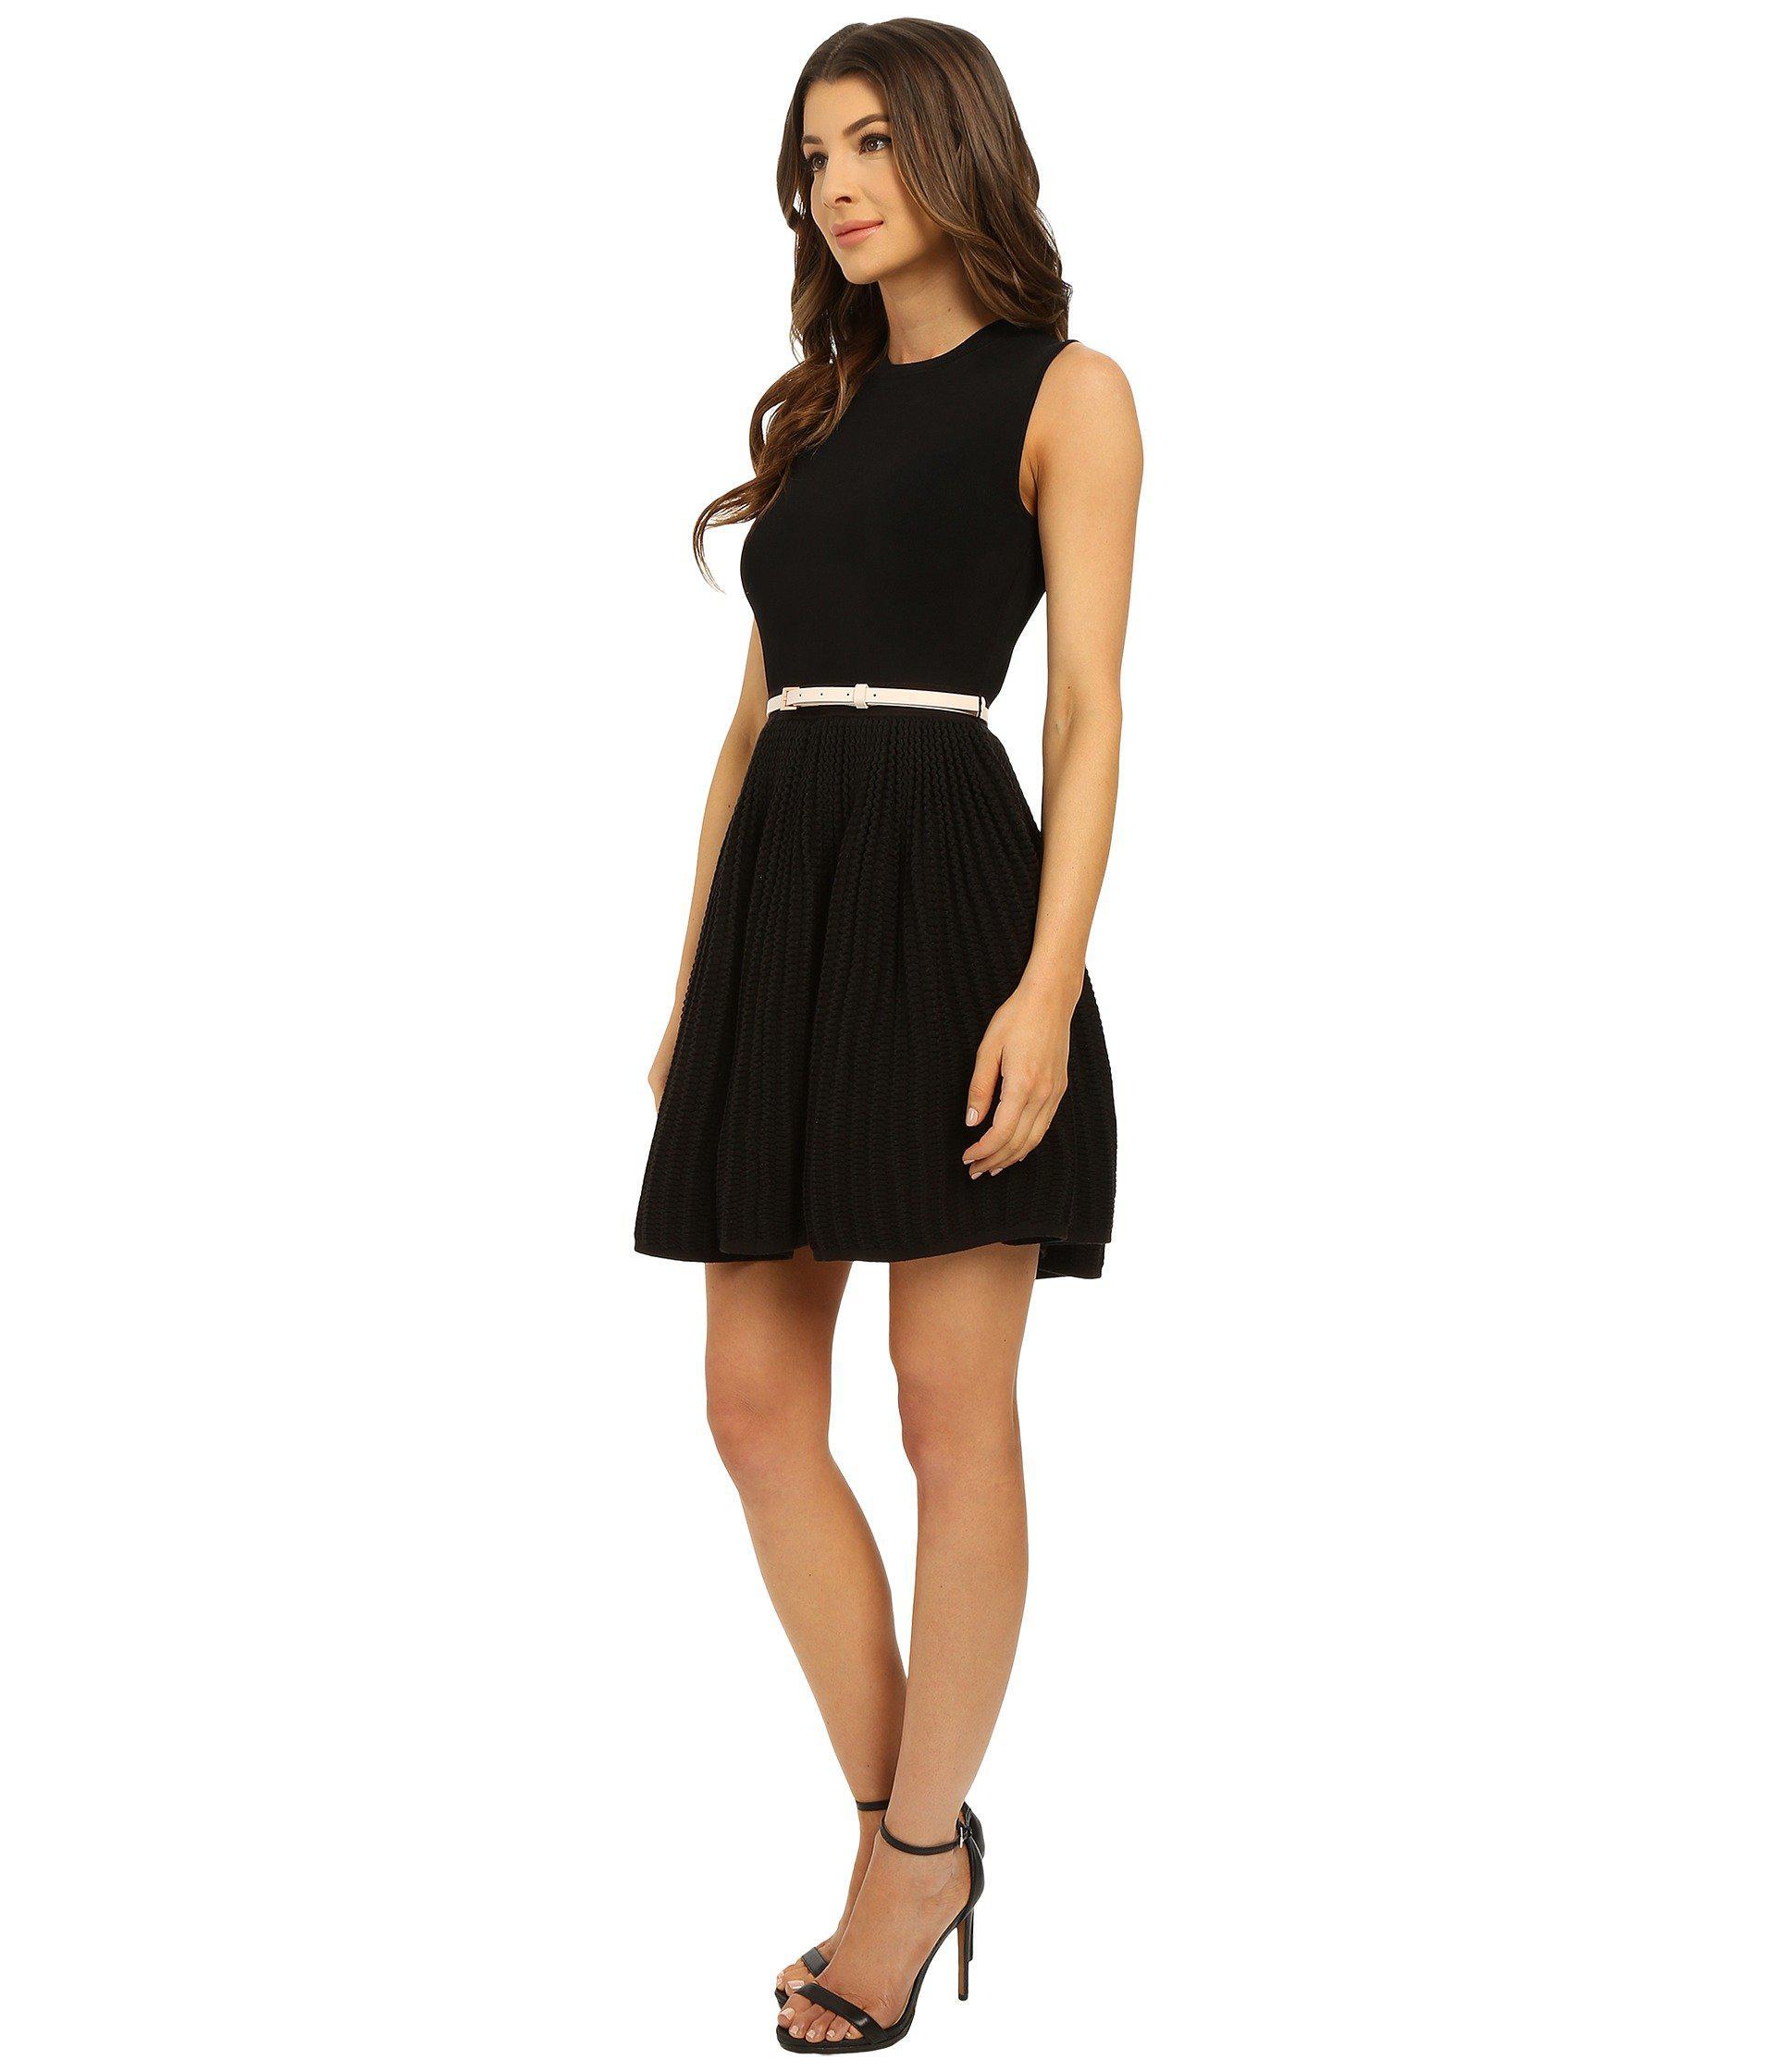 9d4a30b8b Lyst - Ted Baker Alicii Bow Belt Knit Dress in Black